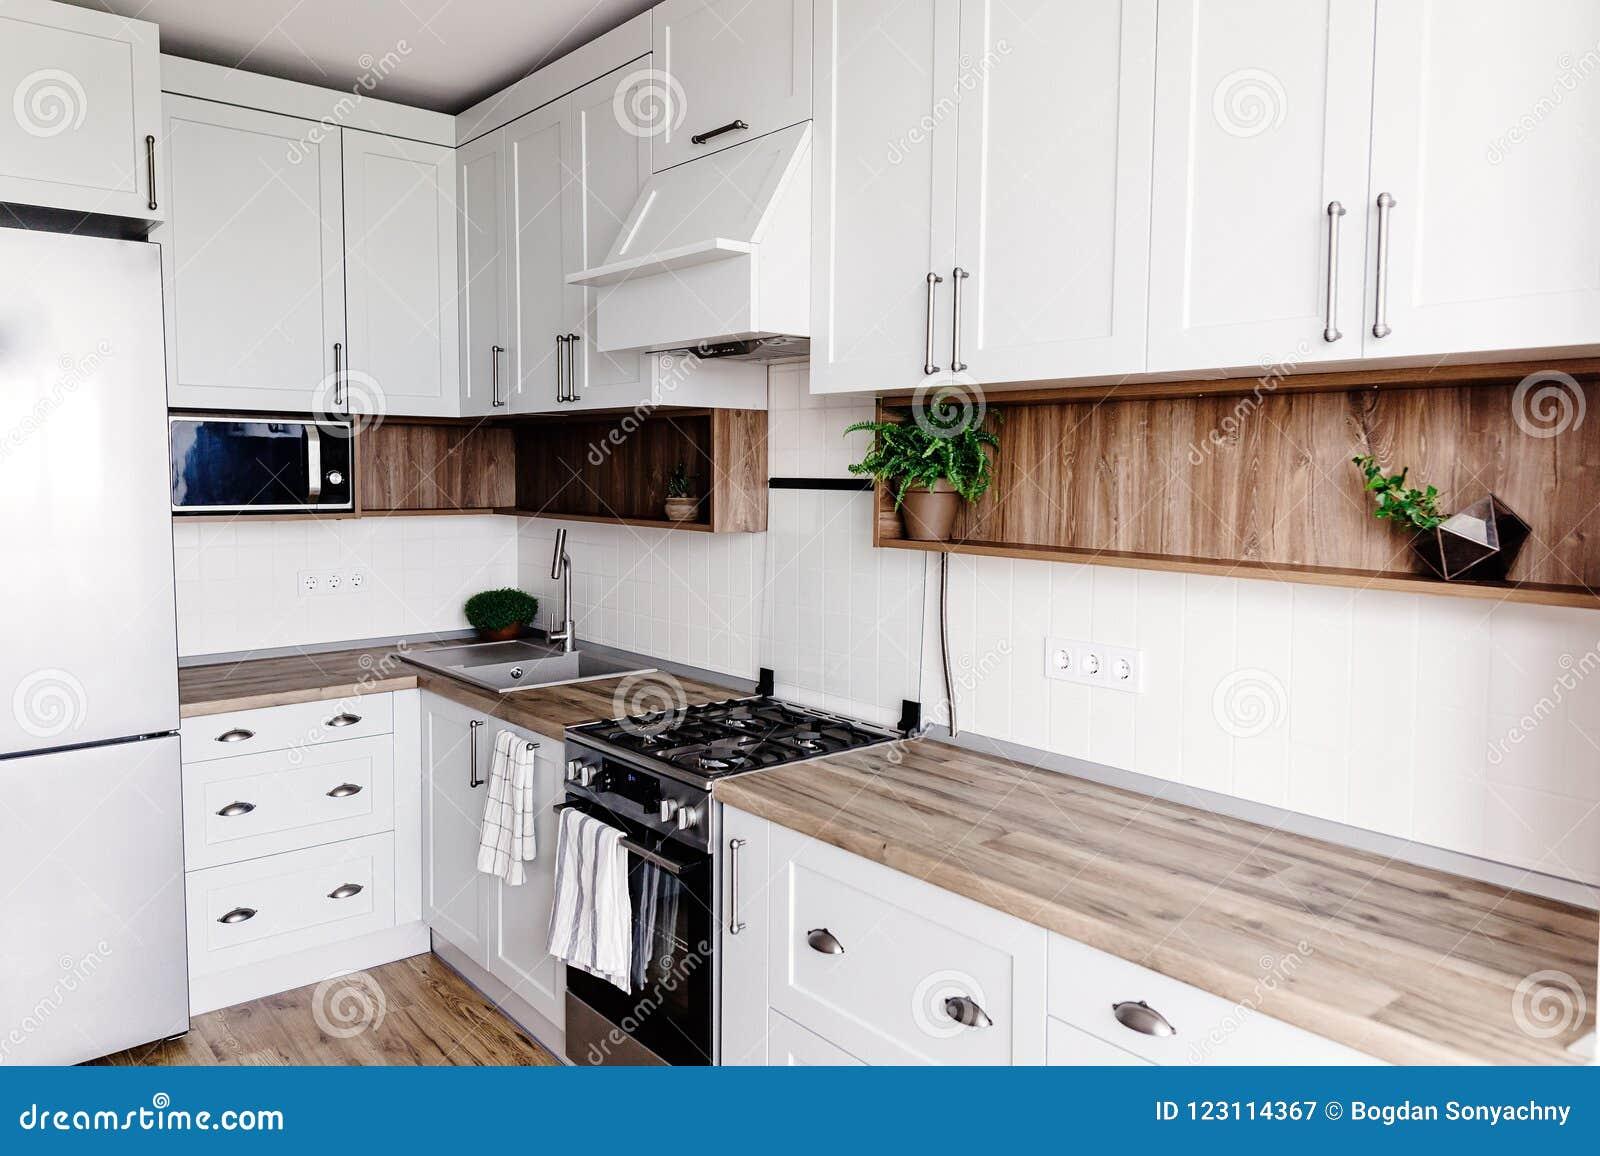 Kitchen Design In Modern Scandinavian Style. Stylish Light Grey ...